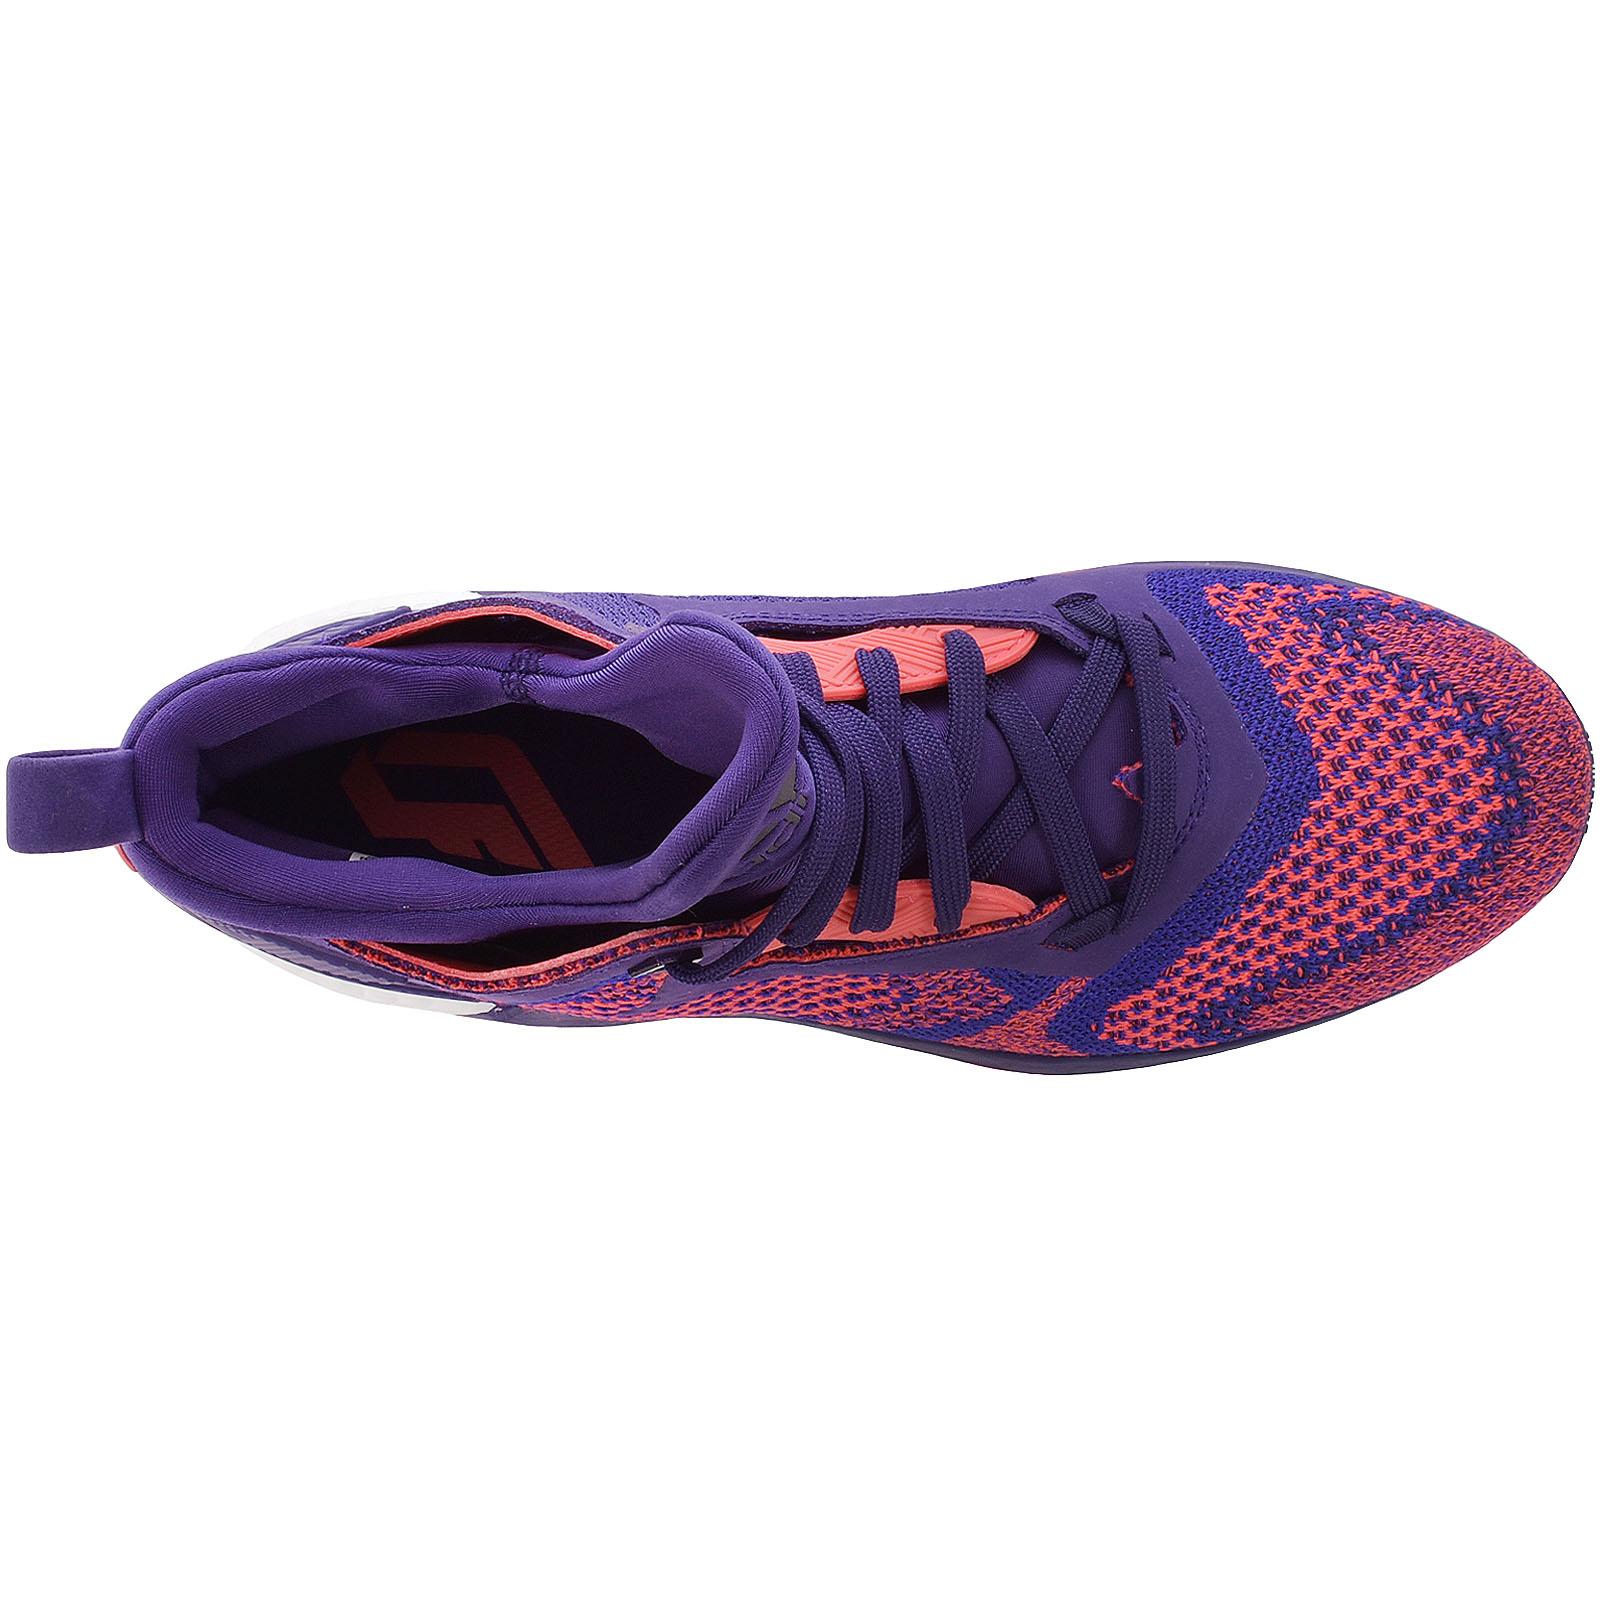 Details about adidas Performance D Lillard 2 Boost Primeknit Basketball Trainers Shoes Purple